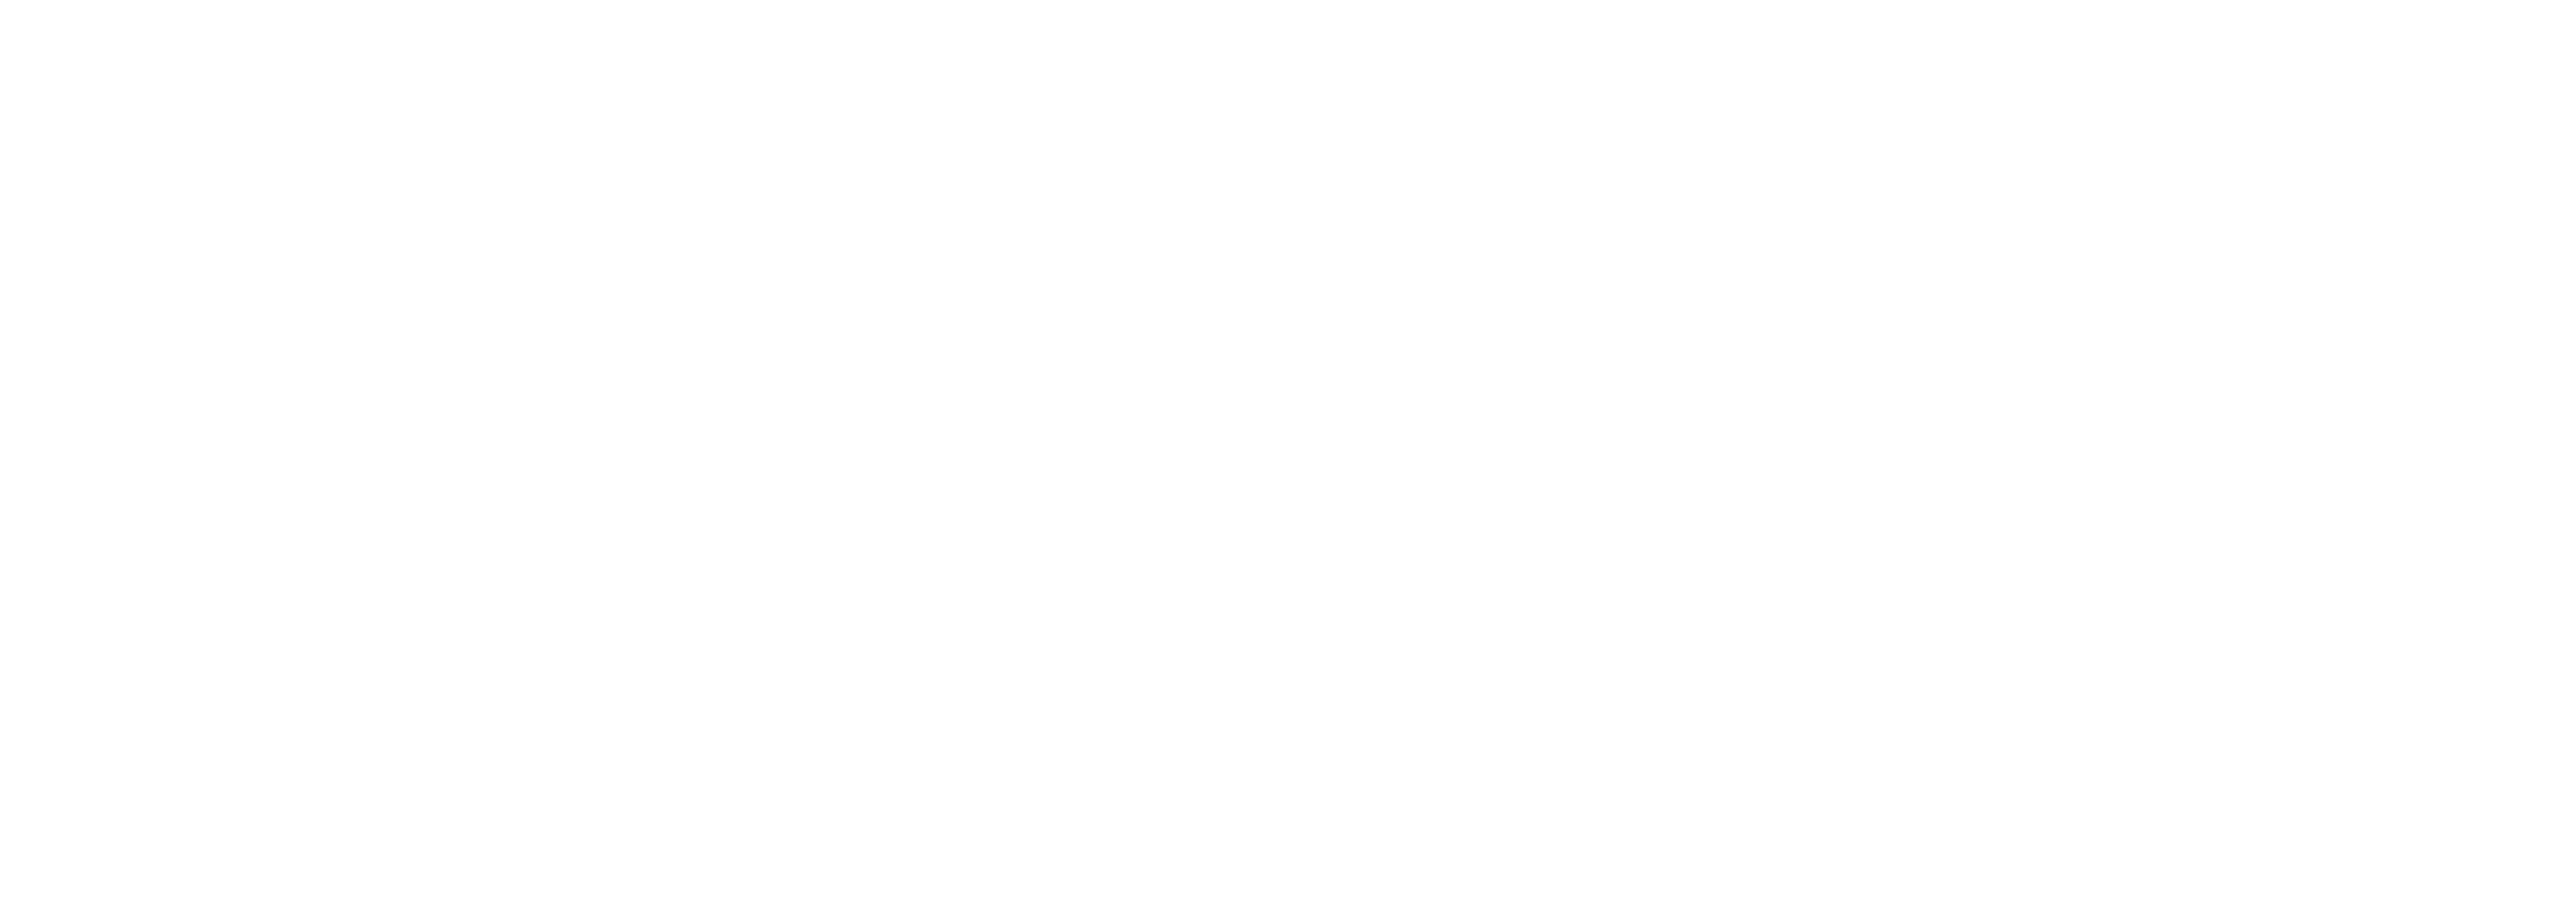 Nike Logo Backgrounds - Wallpaper Cave